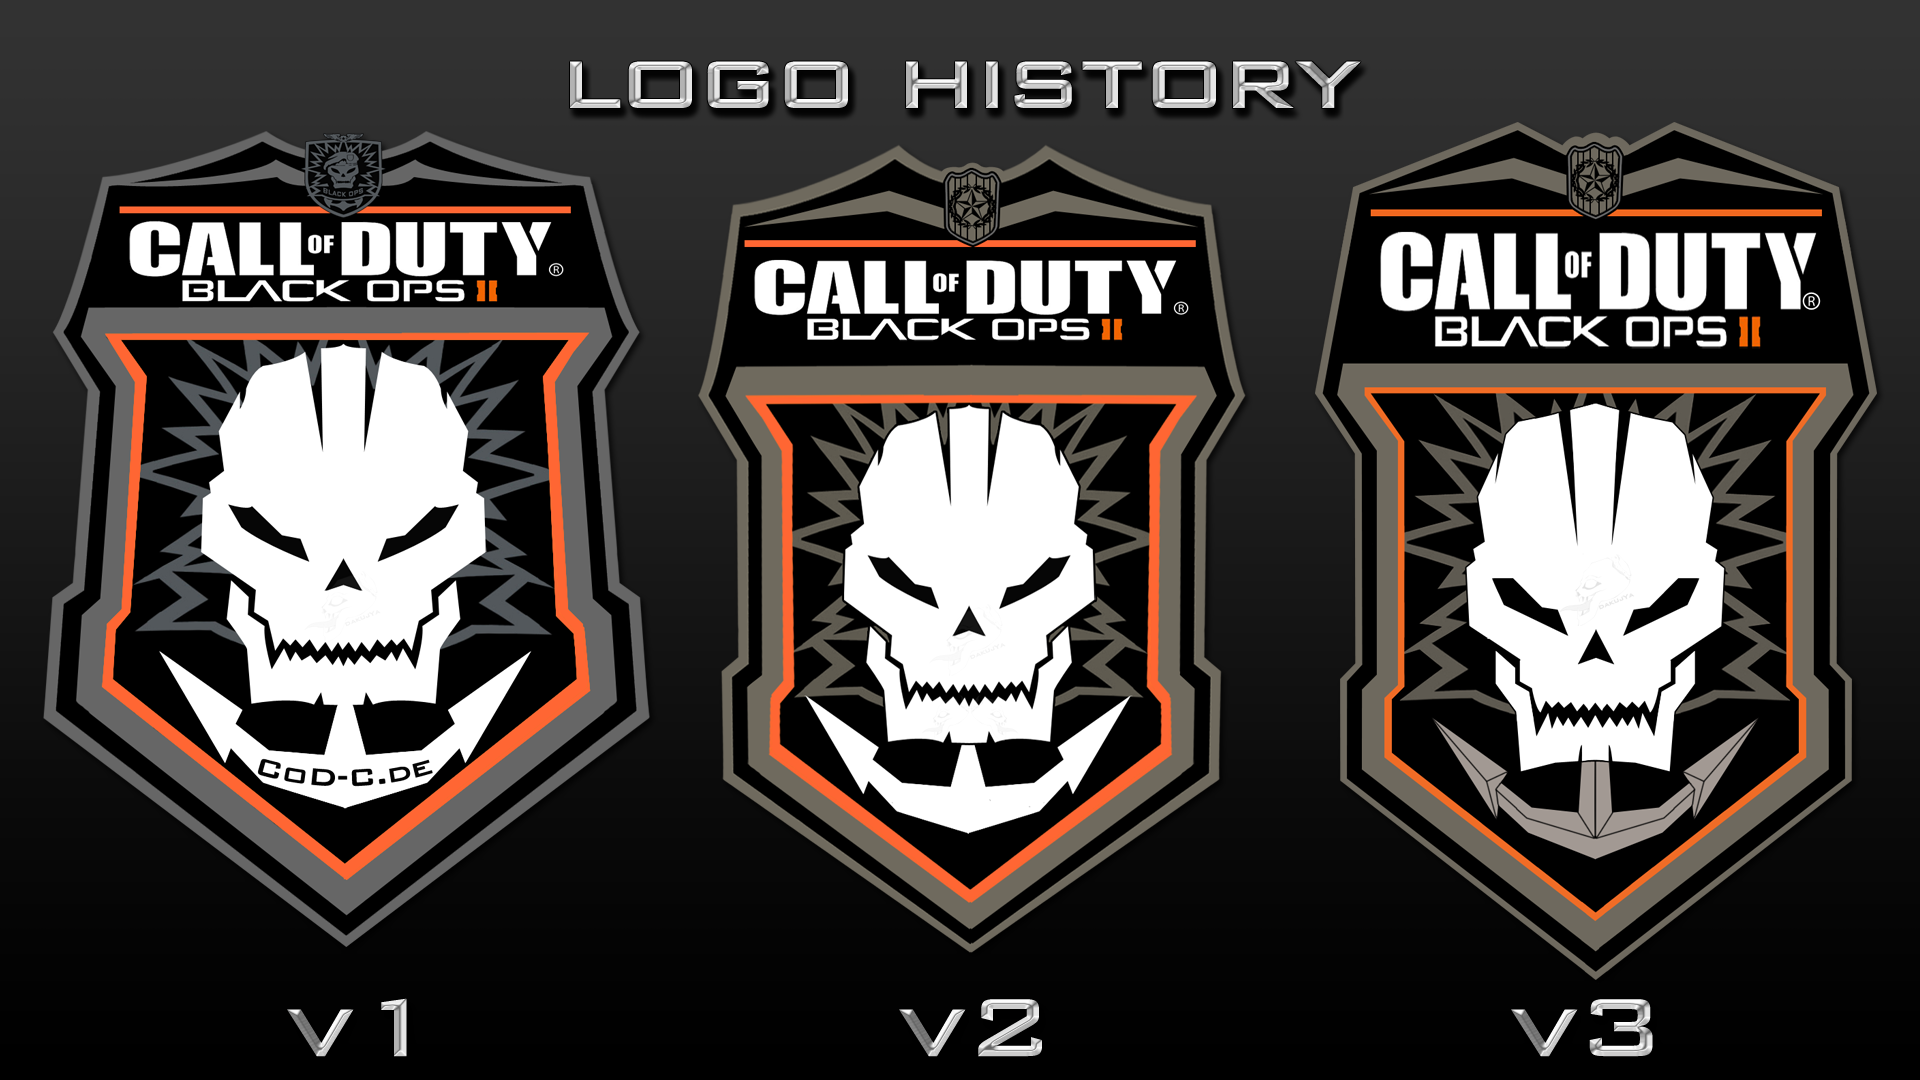 Call Of Duty Black Ops 2 Official Logo Render By Dakujya On Deviantart